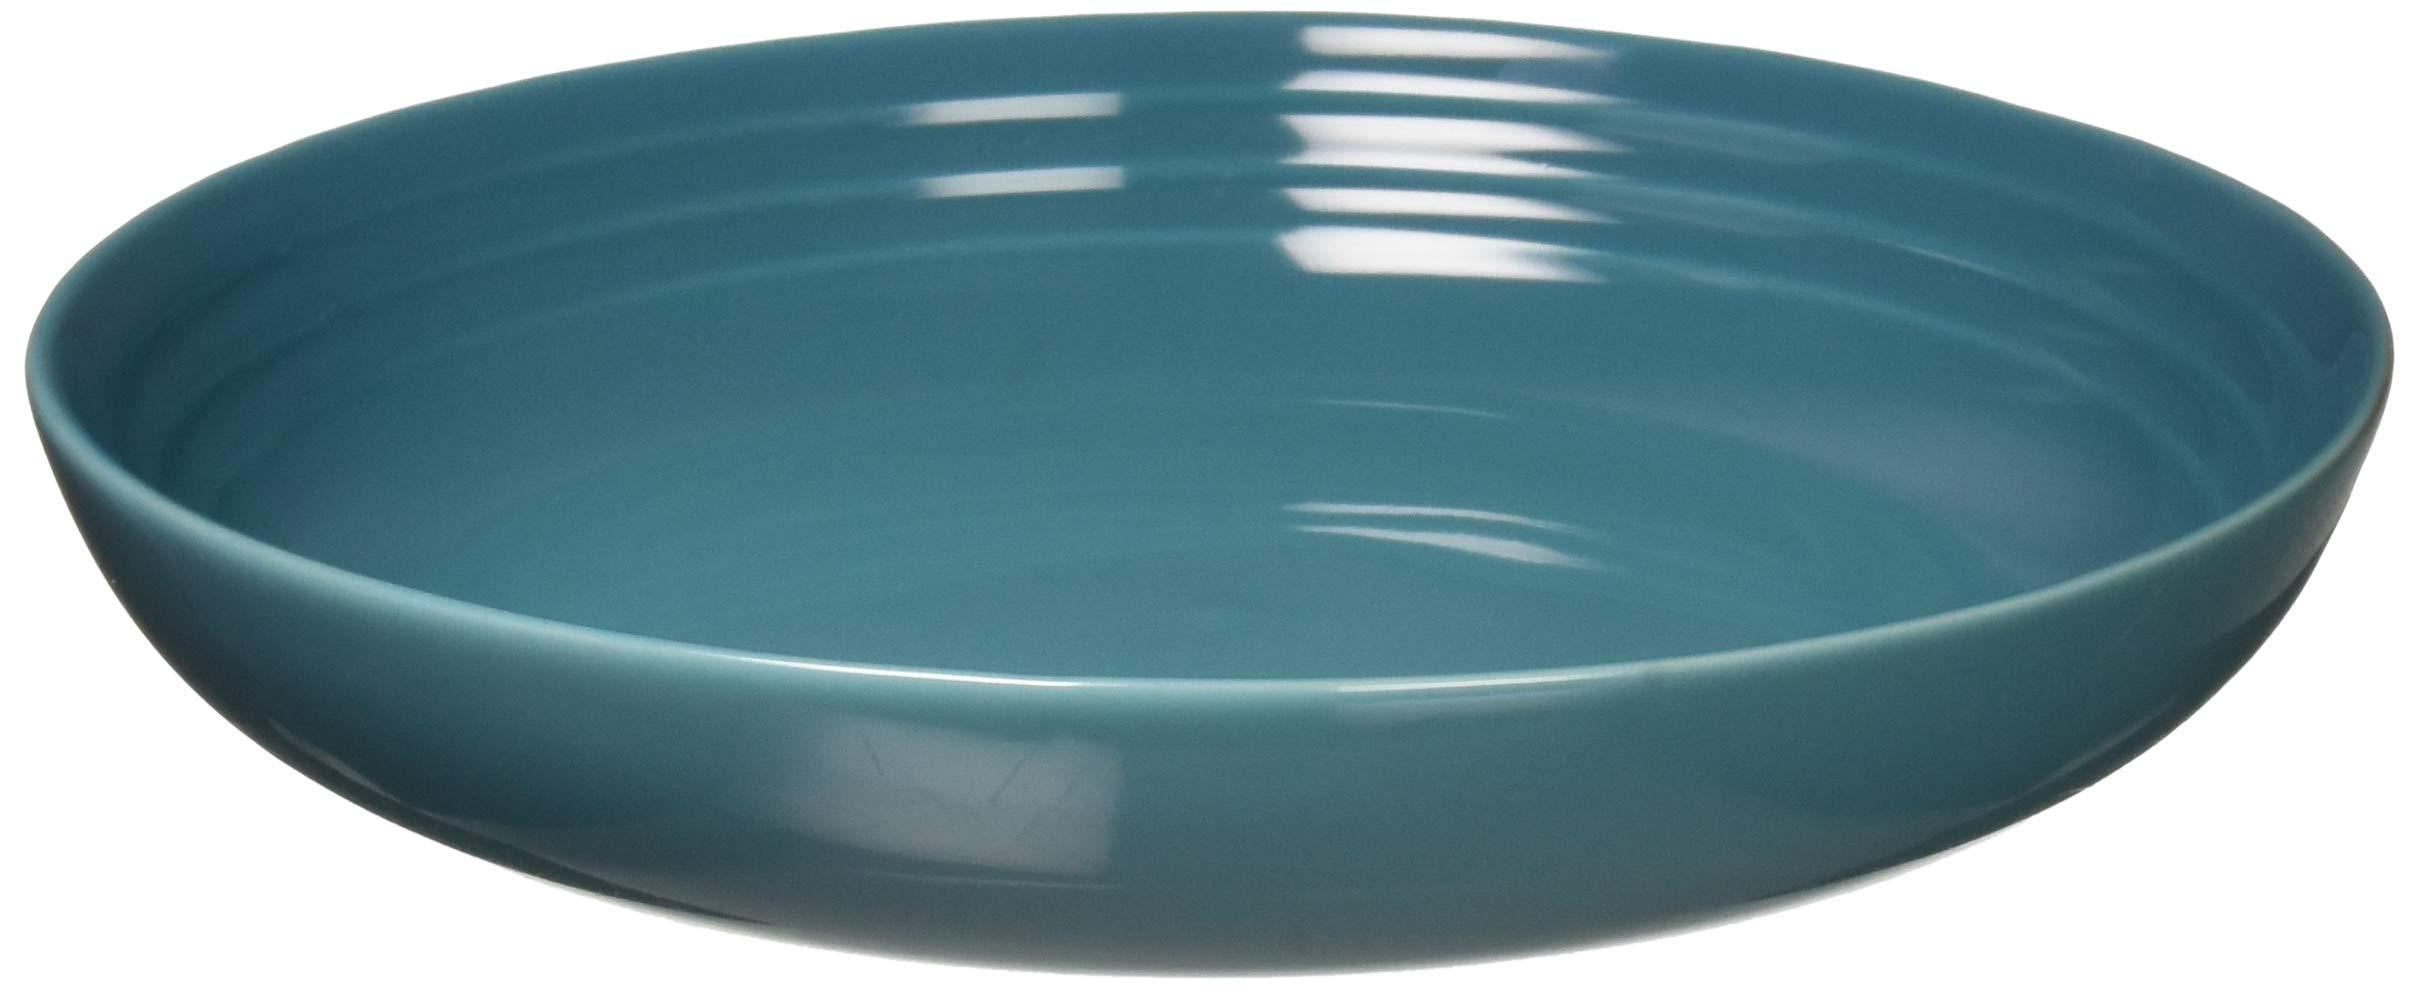 Winco MMB-13 Melamine Grapefruit Bowl, 13-Ounce, Tan by Winco (Image #1)